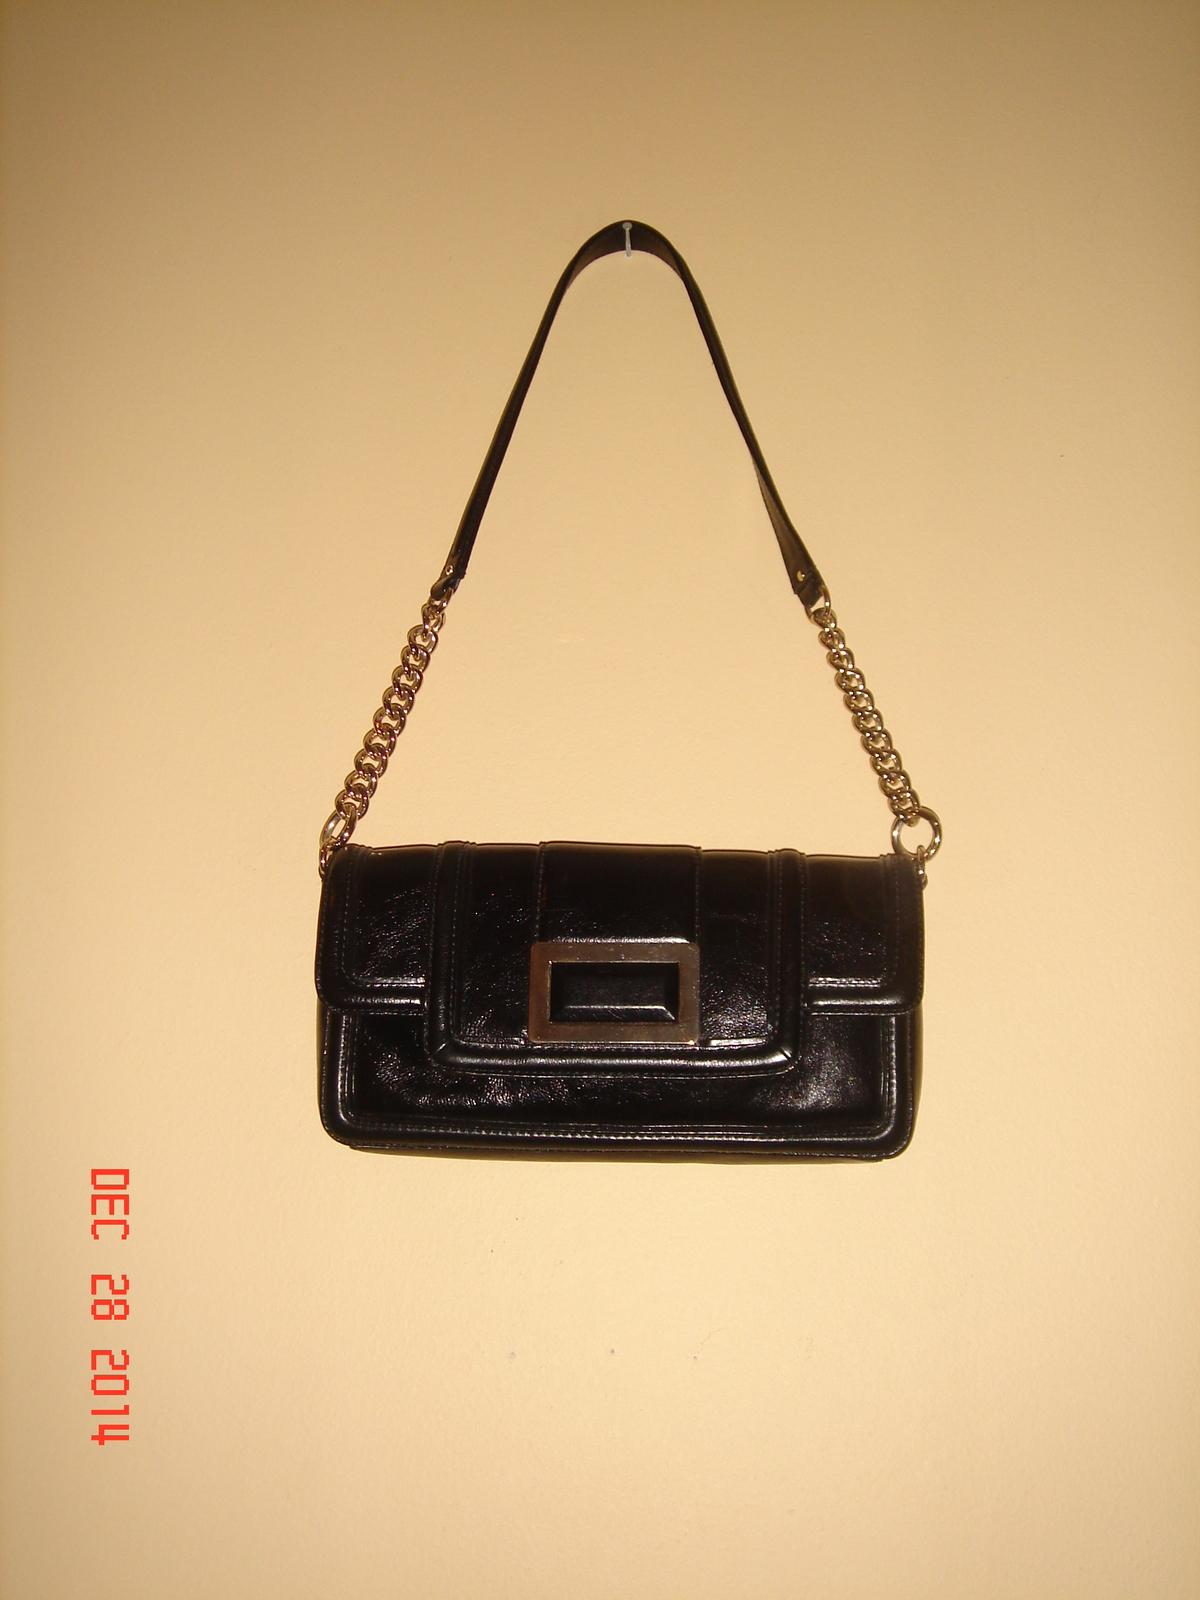 Banana Republic-Leather Shoulder Bag with golden hardware - Handbags ...